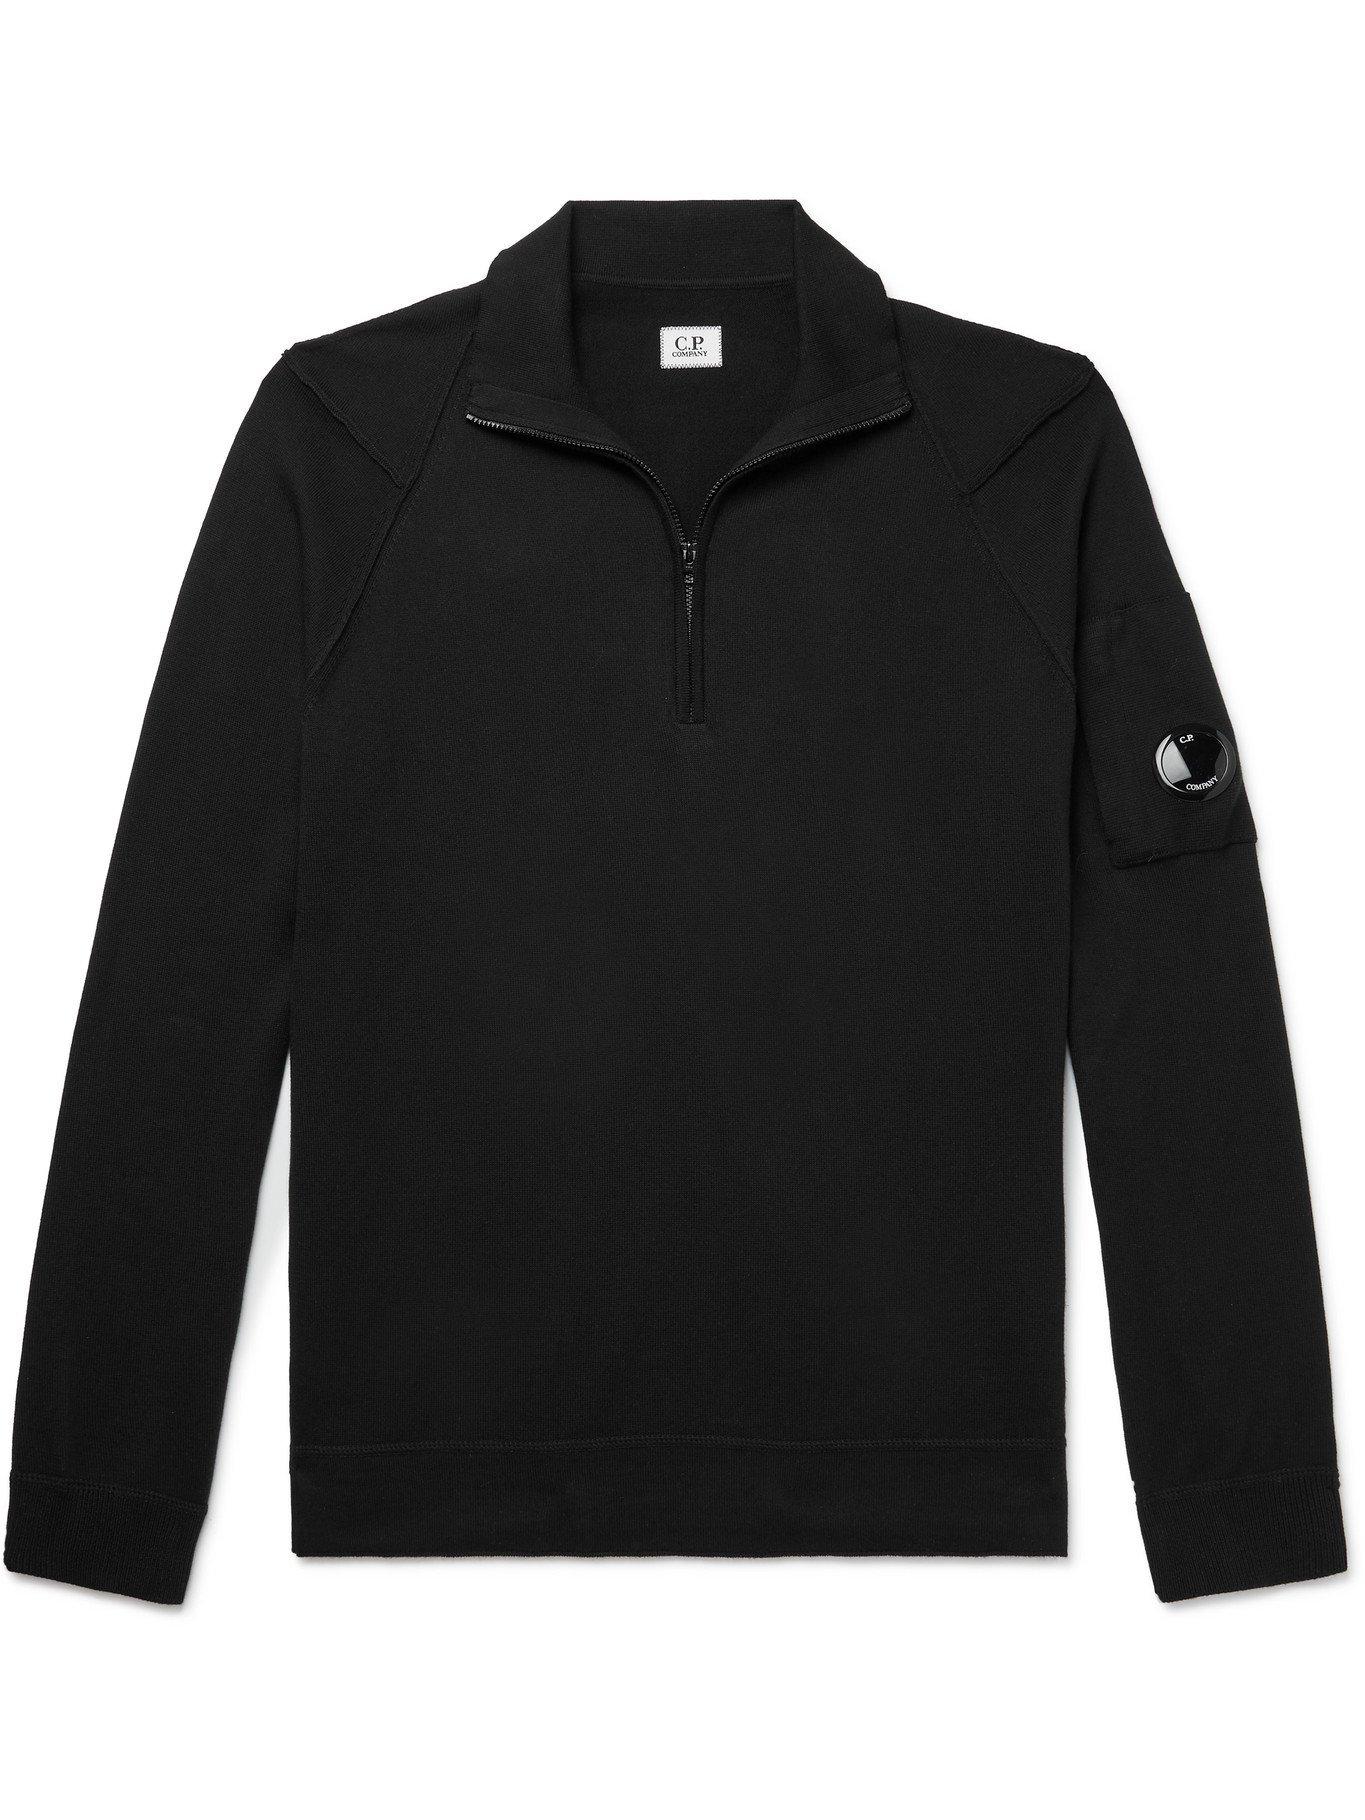 Photo: C.P. COMPANY - Sea Island Cotton Half-Zip Sweater - Black - IT 48